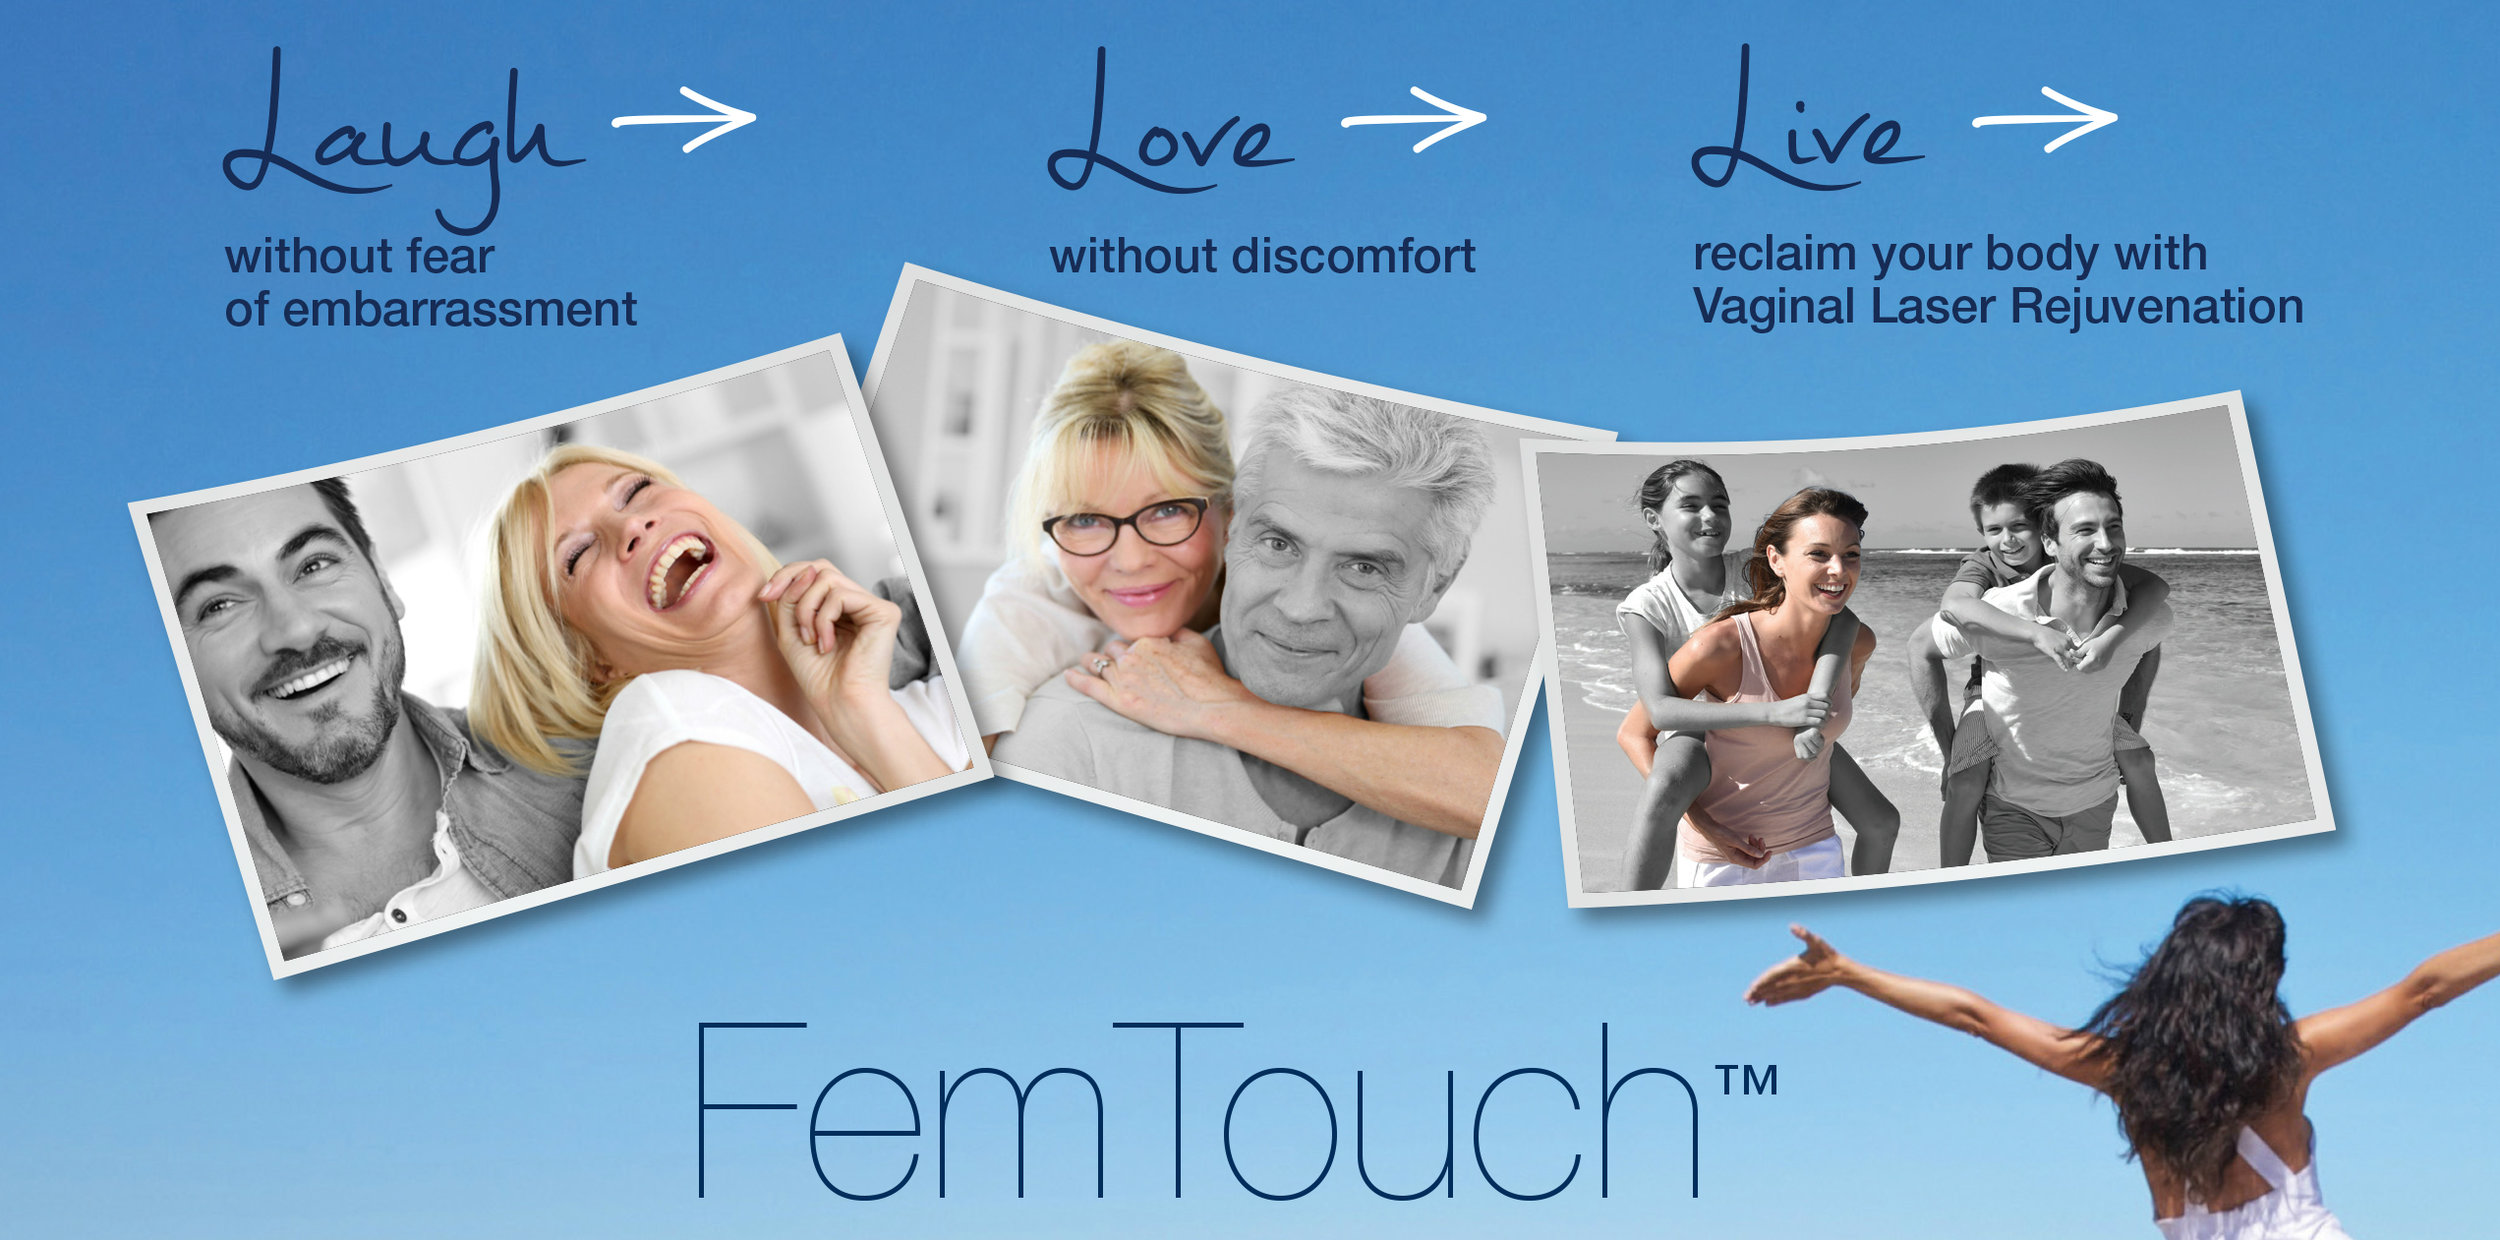 FemTouch-eblast_-As-seen-in-Womens-Health-_Editable (1).jpg